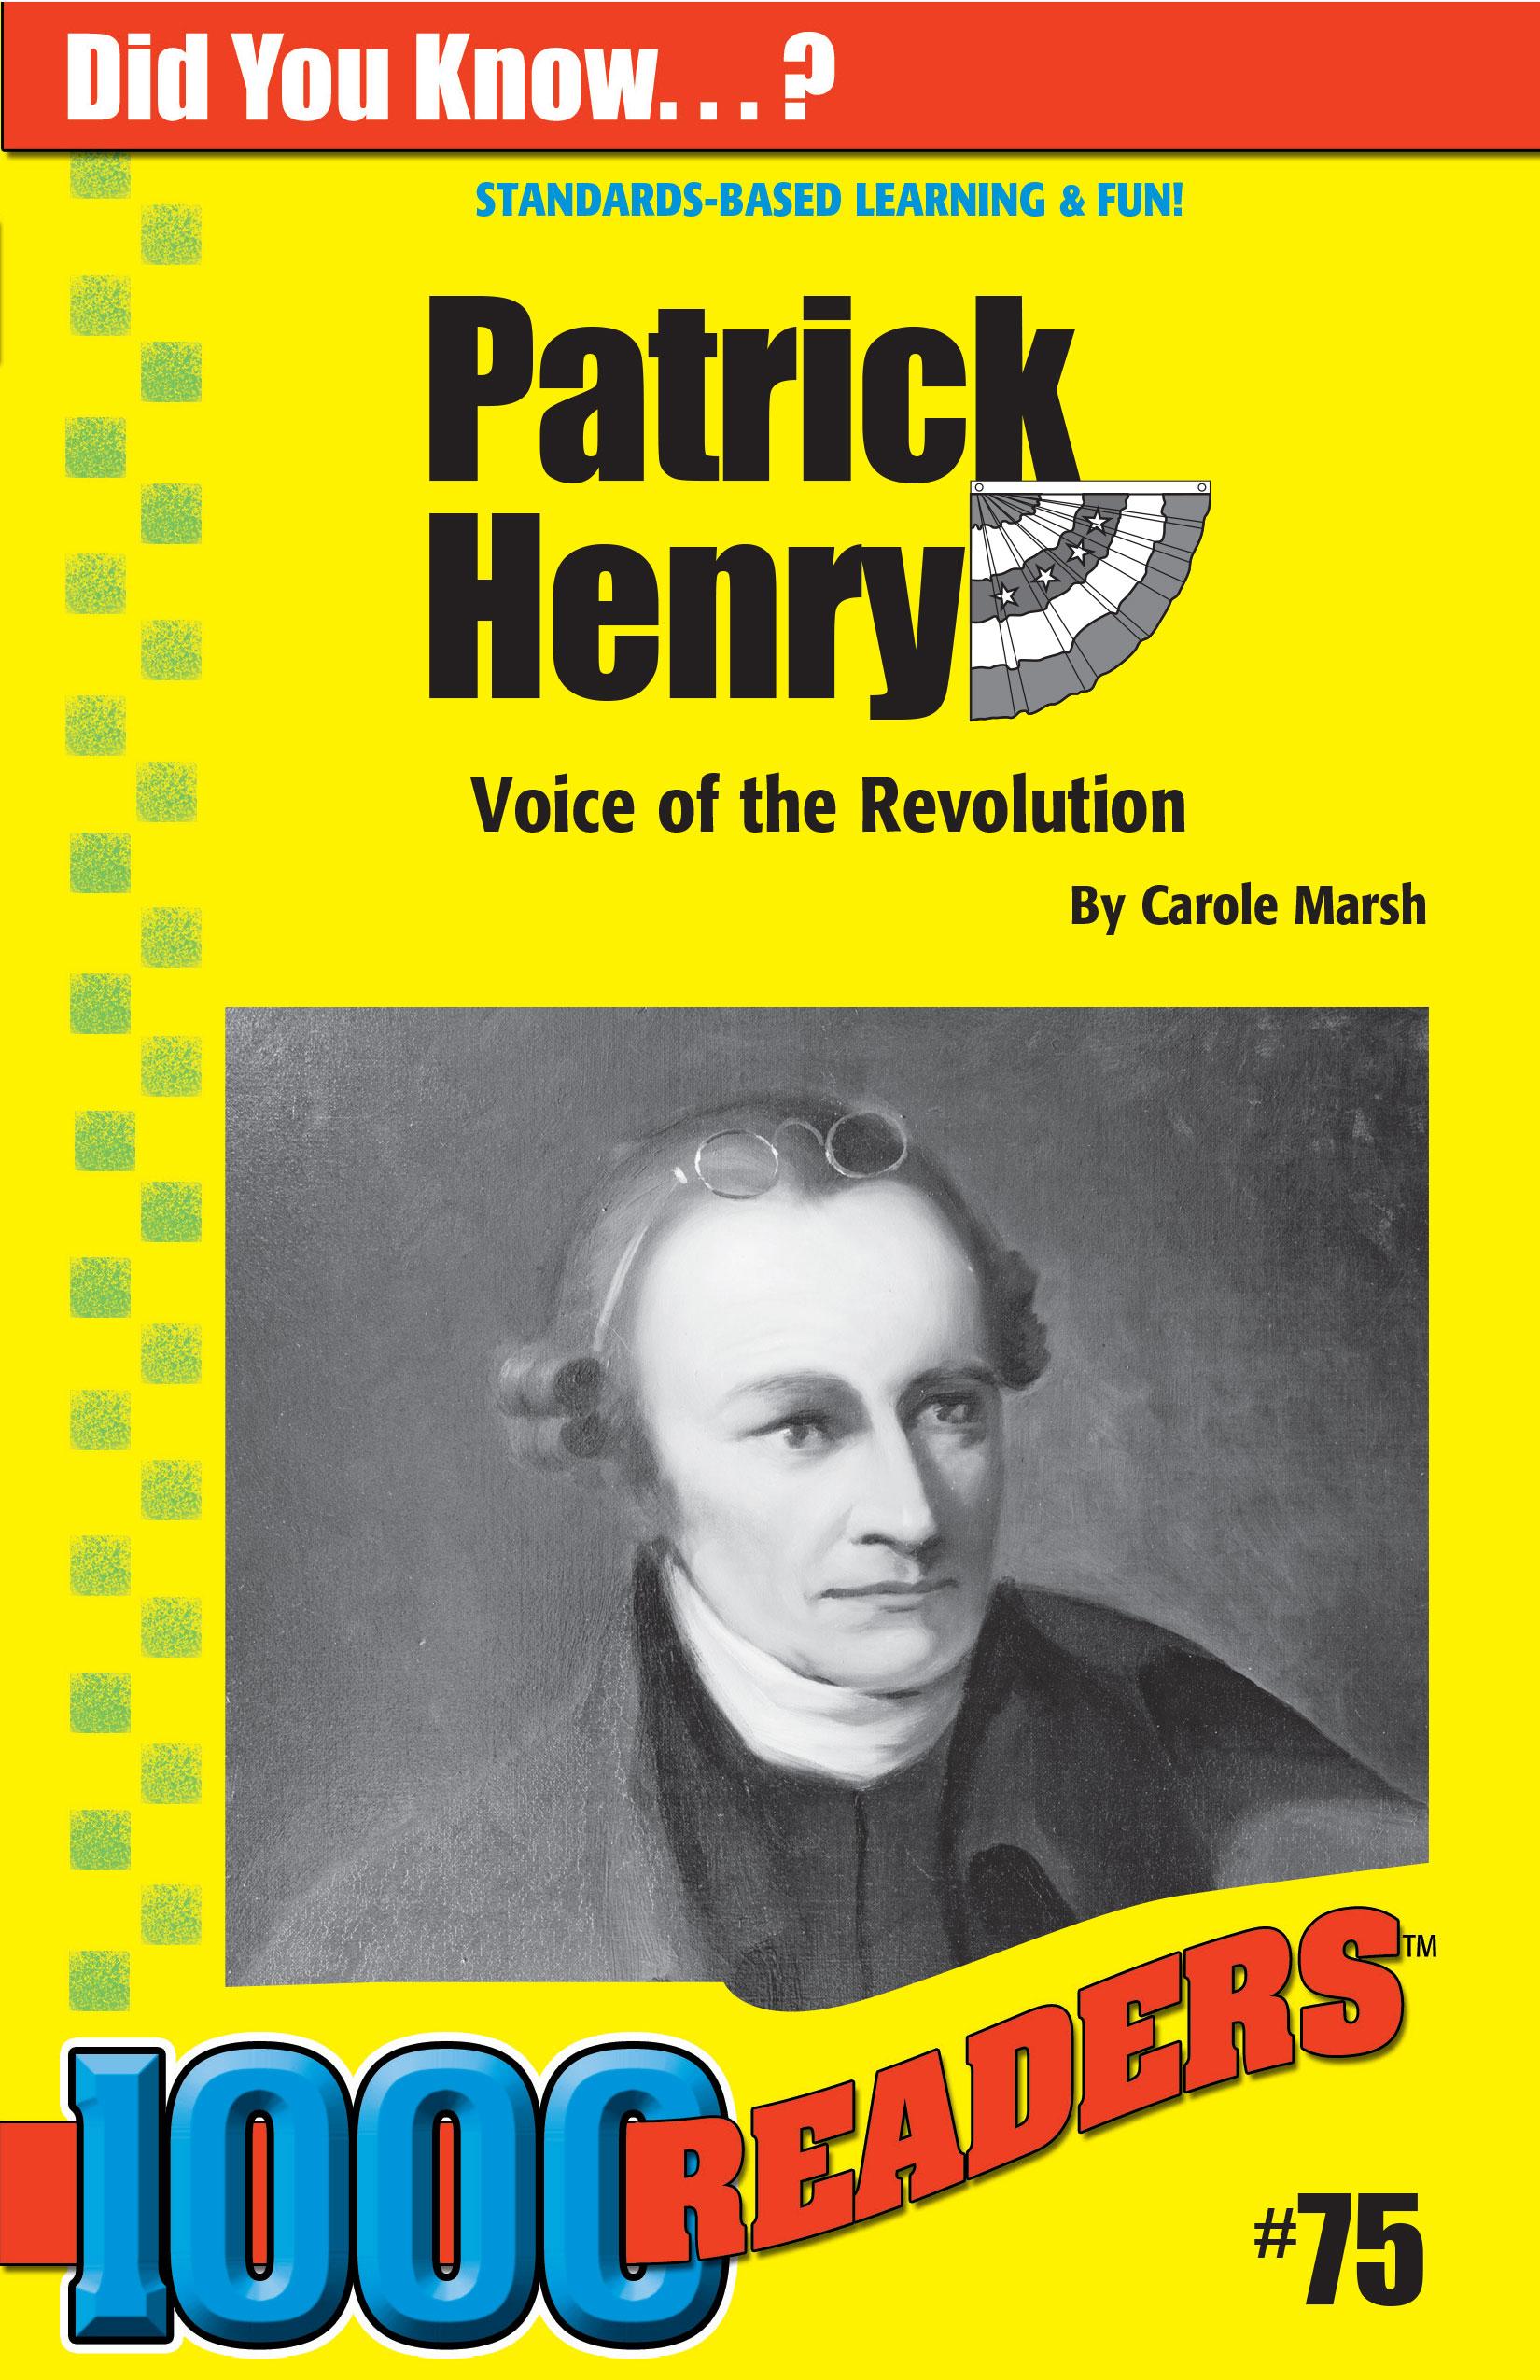 Patrick Henry: Voice of the Revolution